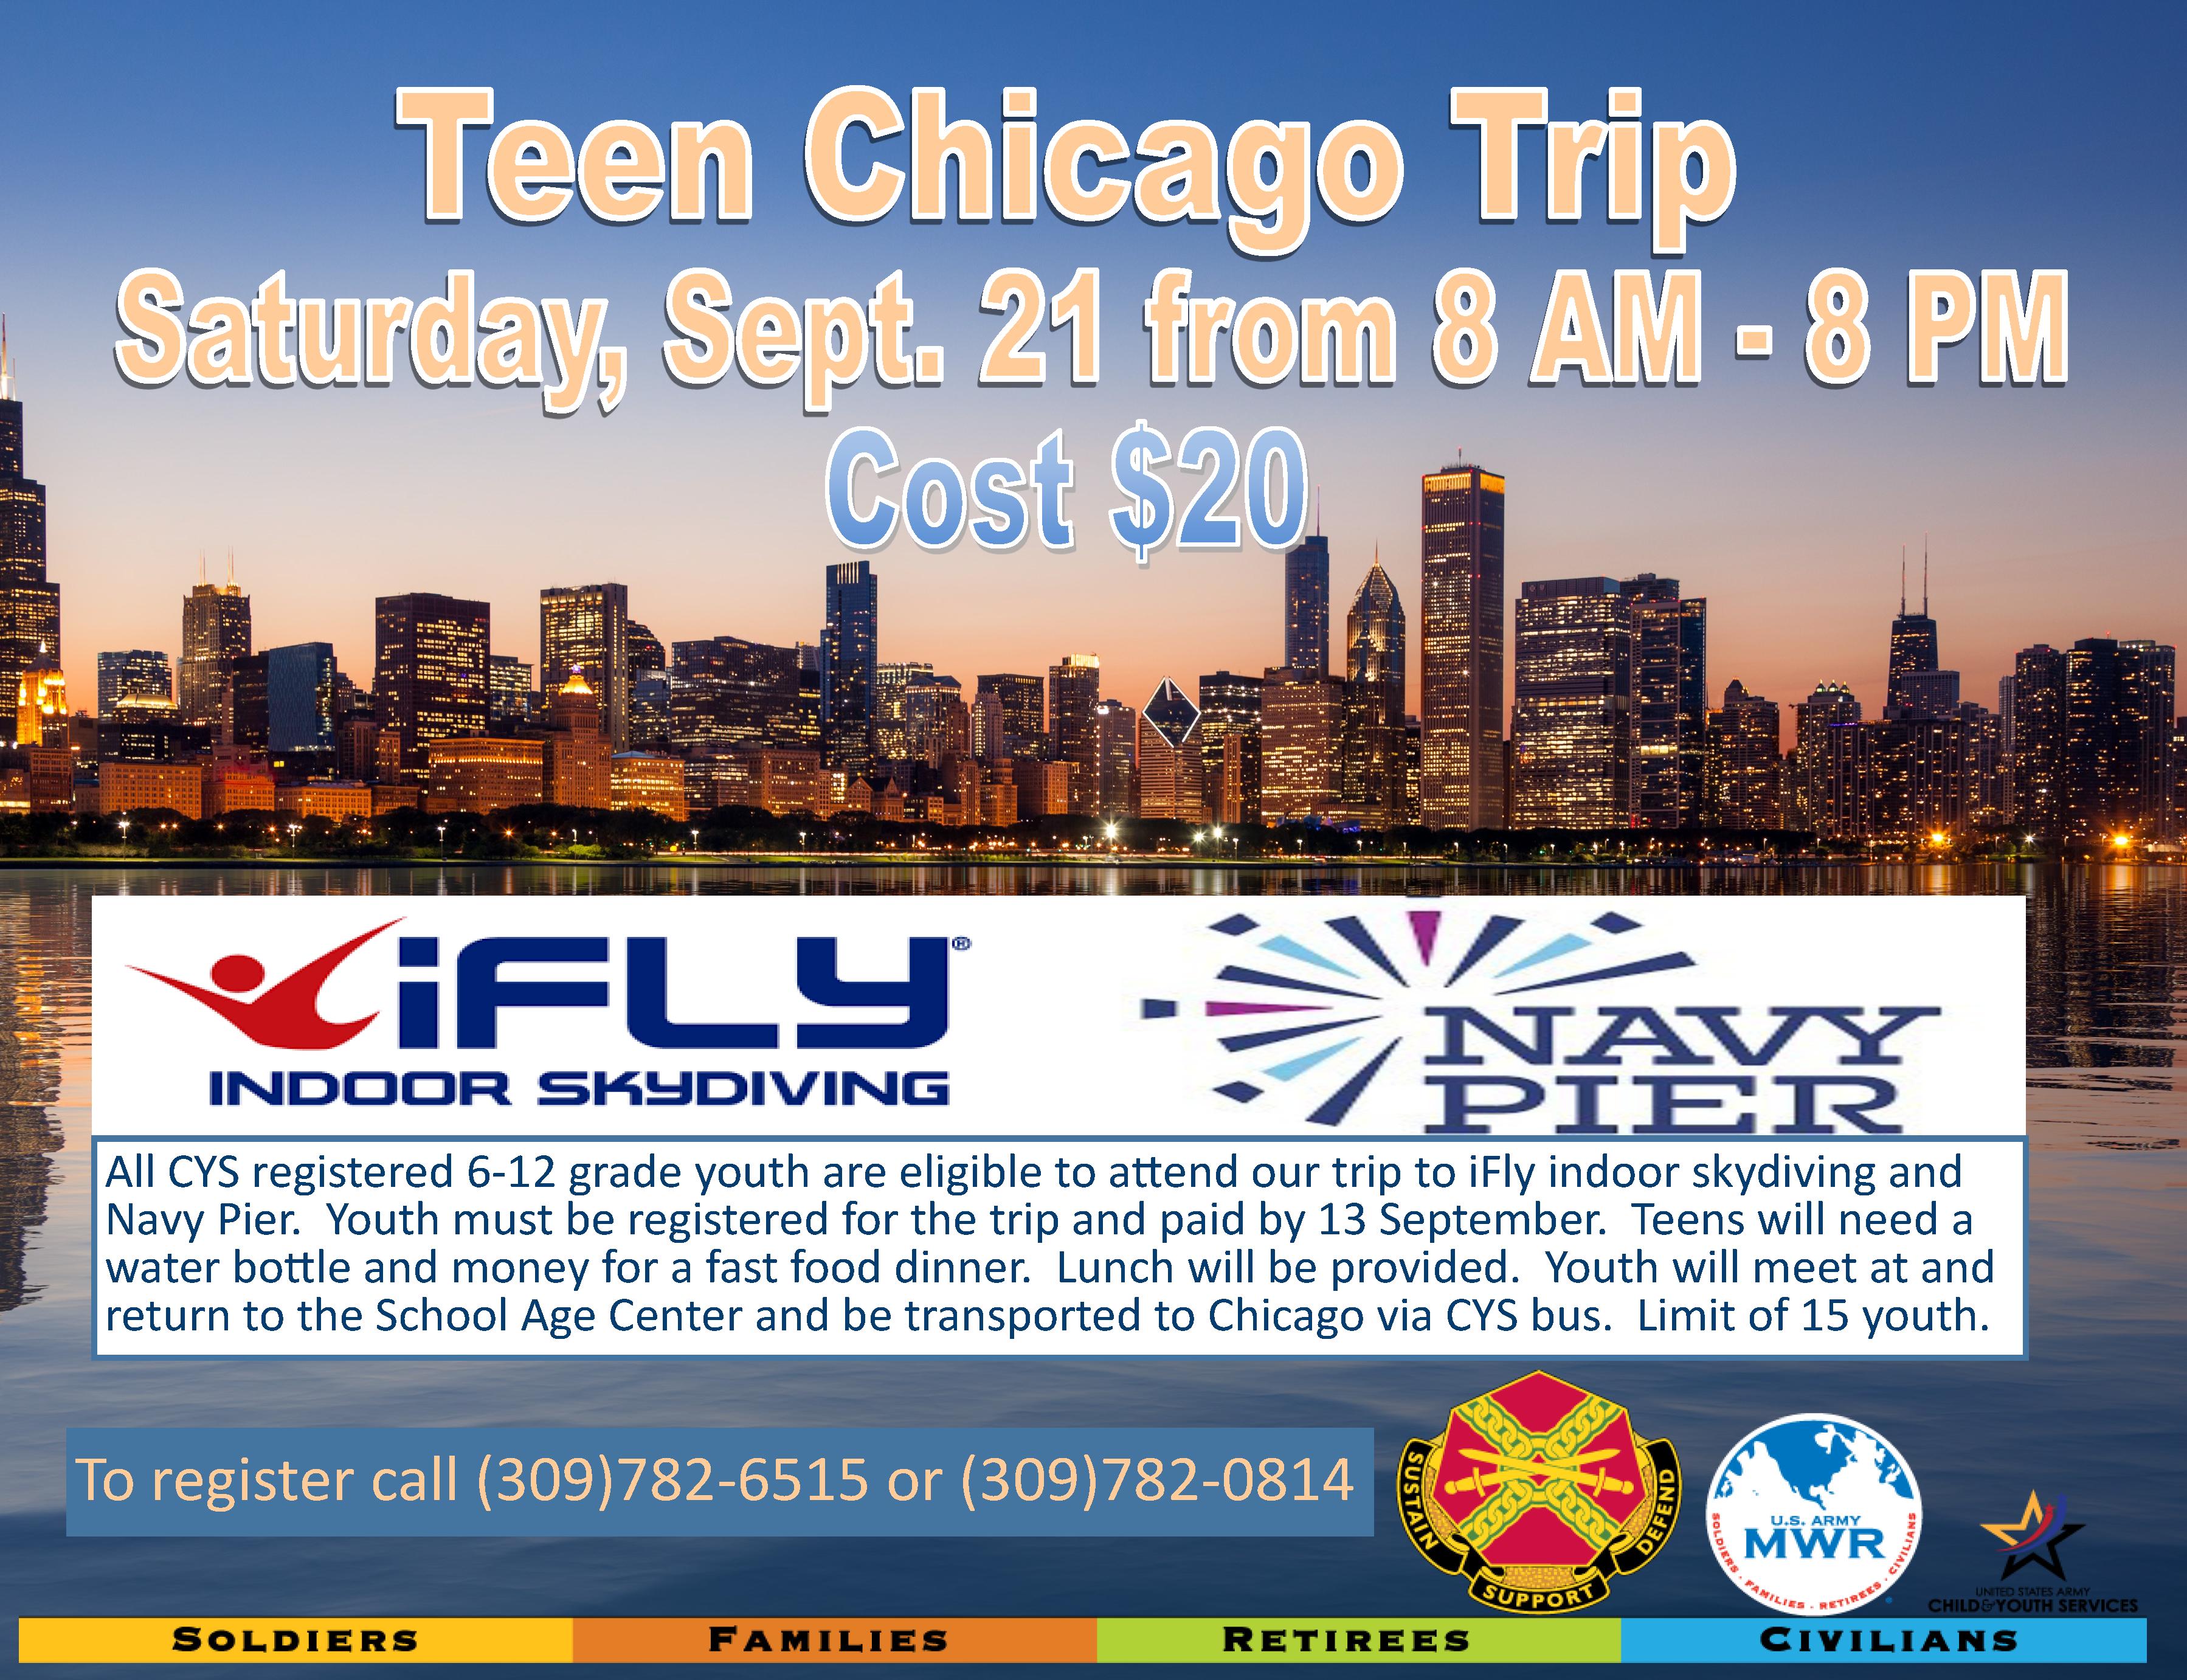 Teen Chicago Trip